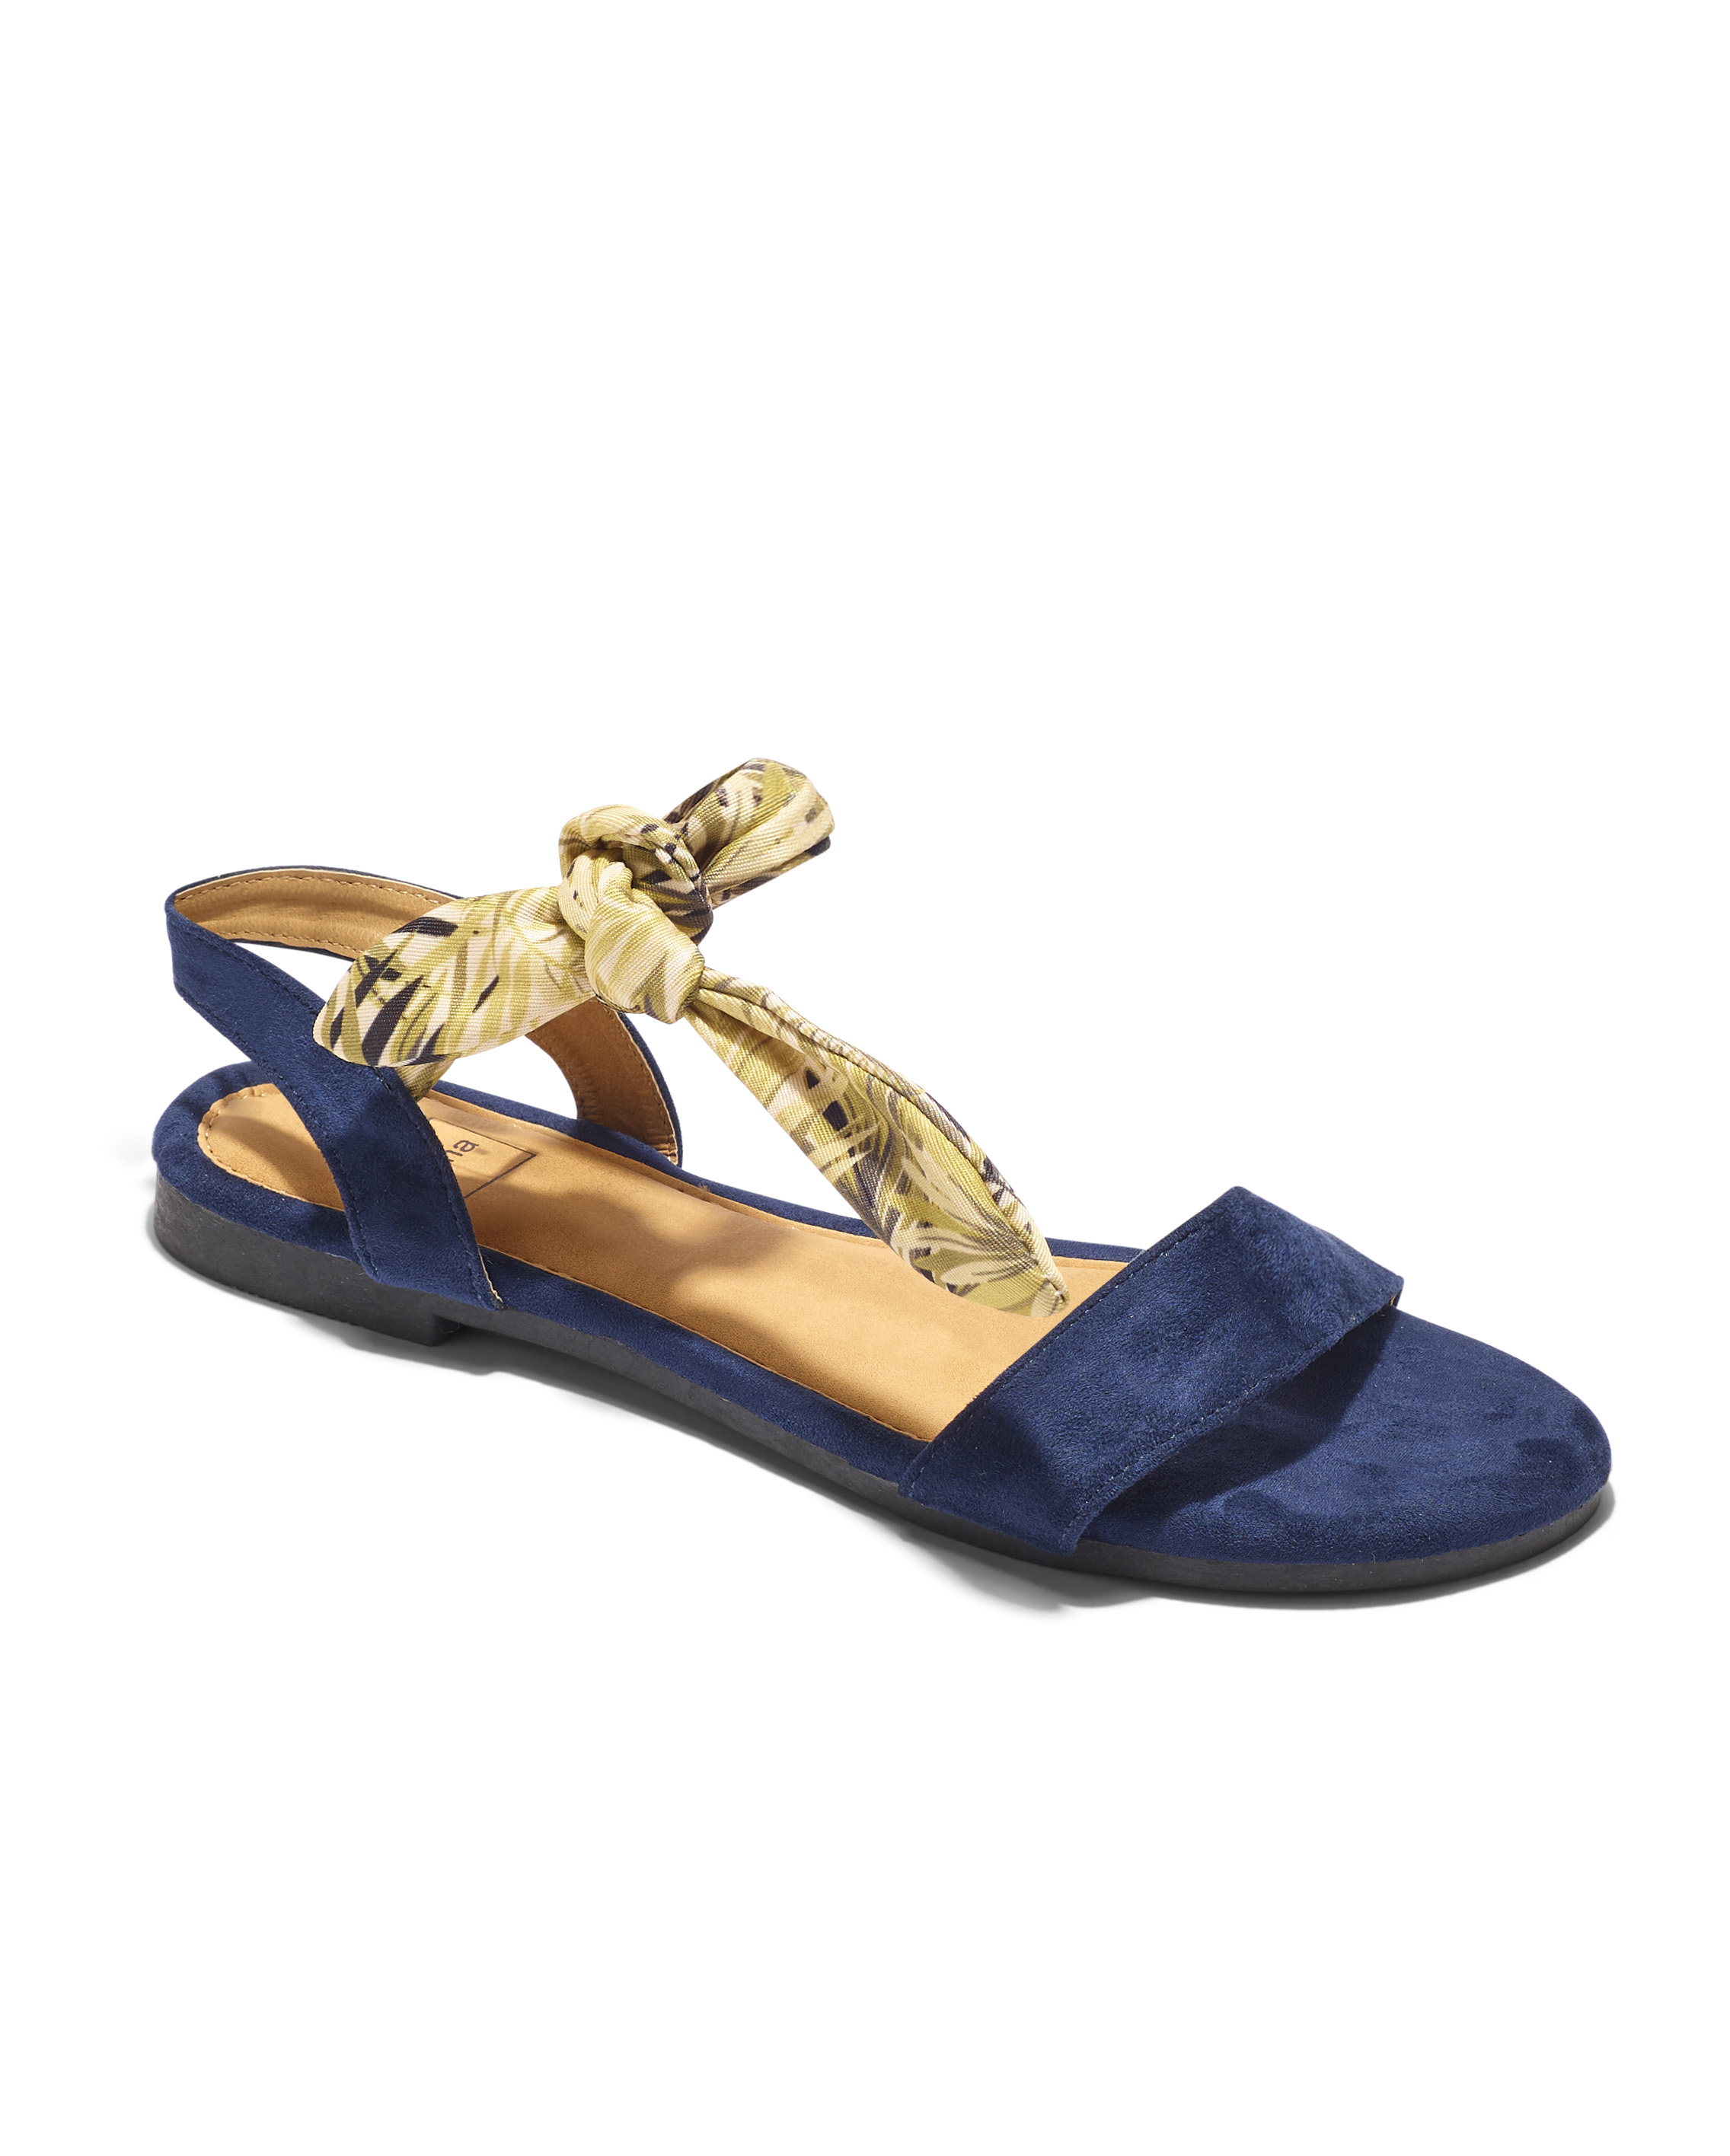 Sandales Plates Femme - Sandale Plate Marine Jina - Style 1 Zh 2021